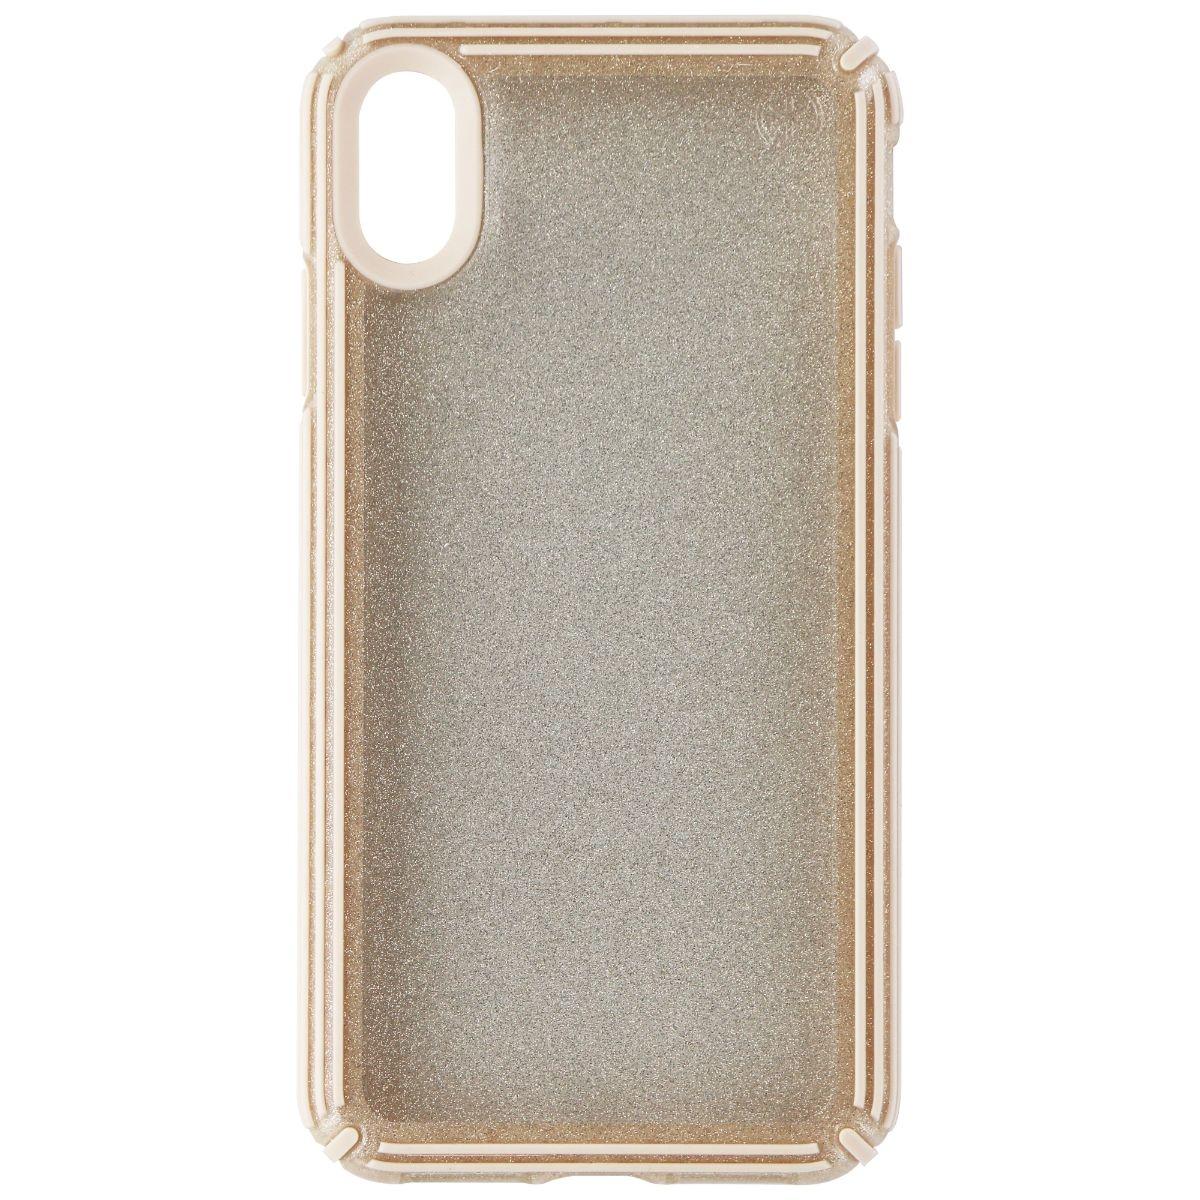 Speck Presidio V-GRIP Case for Apple iPhone XS Max - Gold Glitter/Calfskin Brown